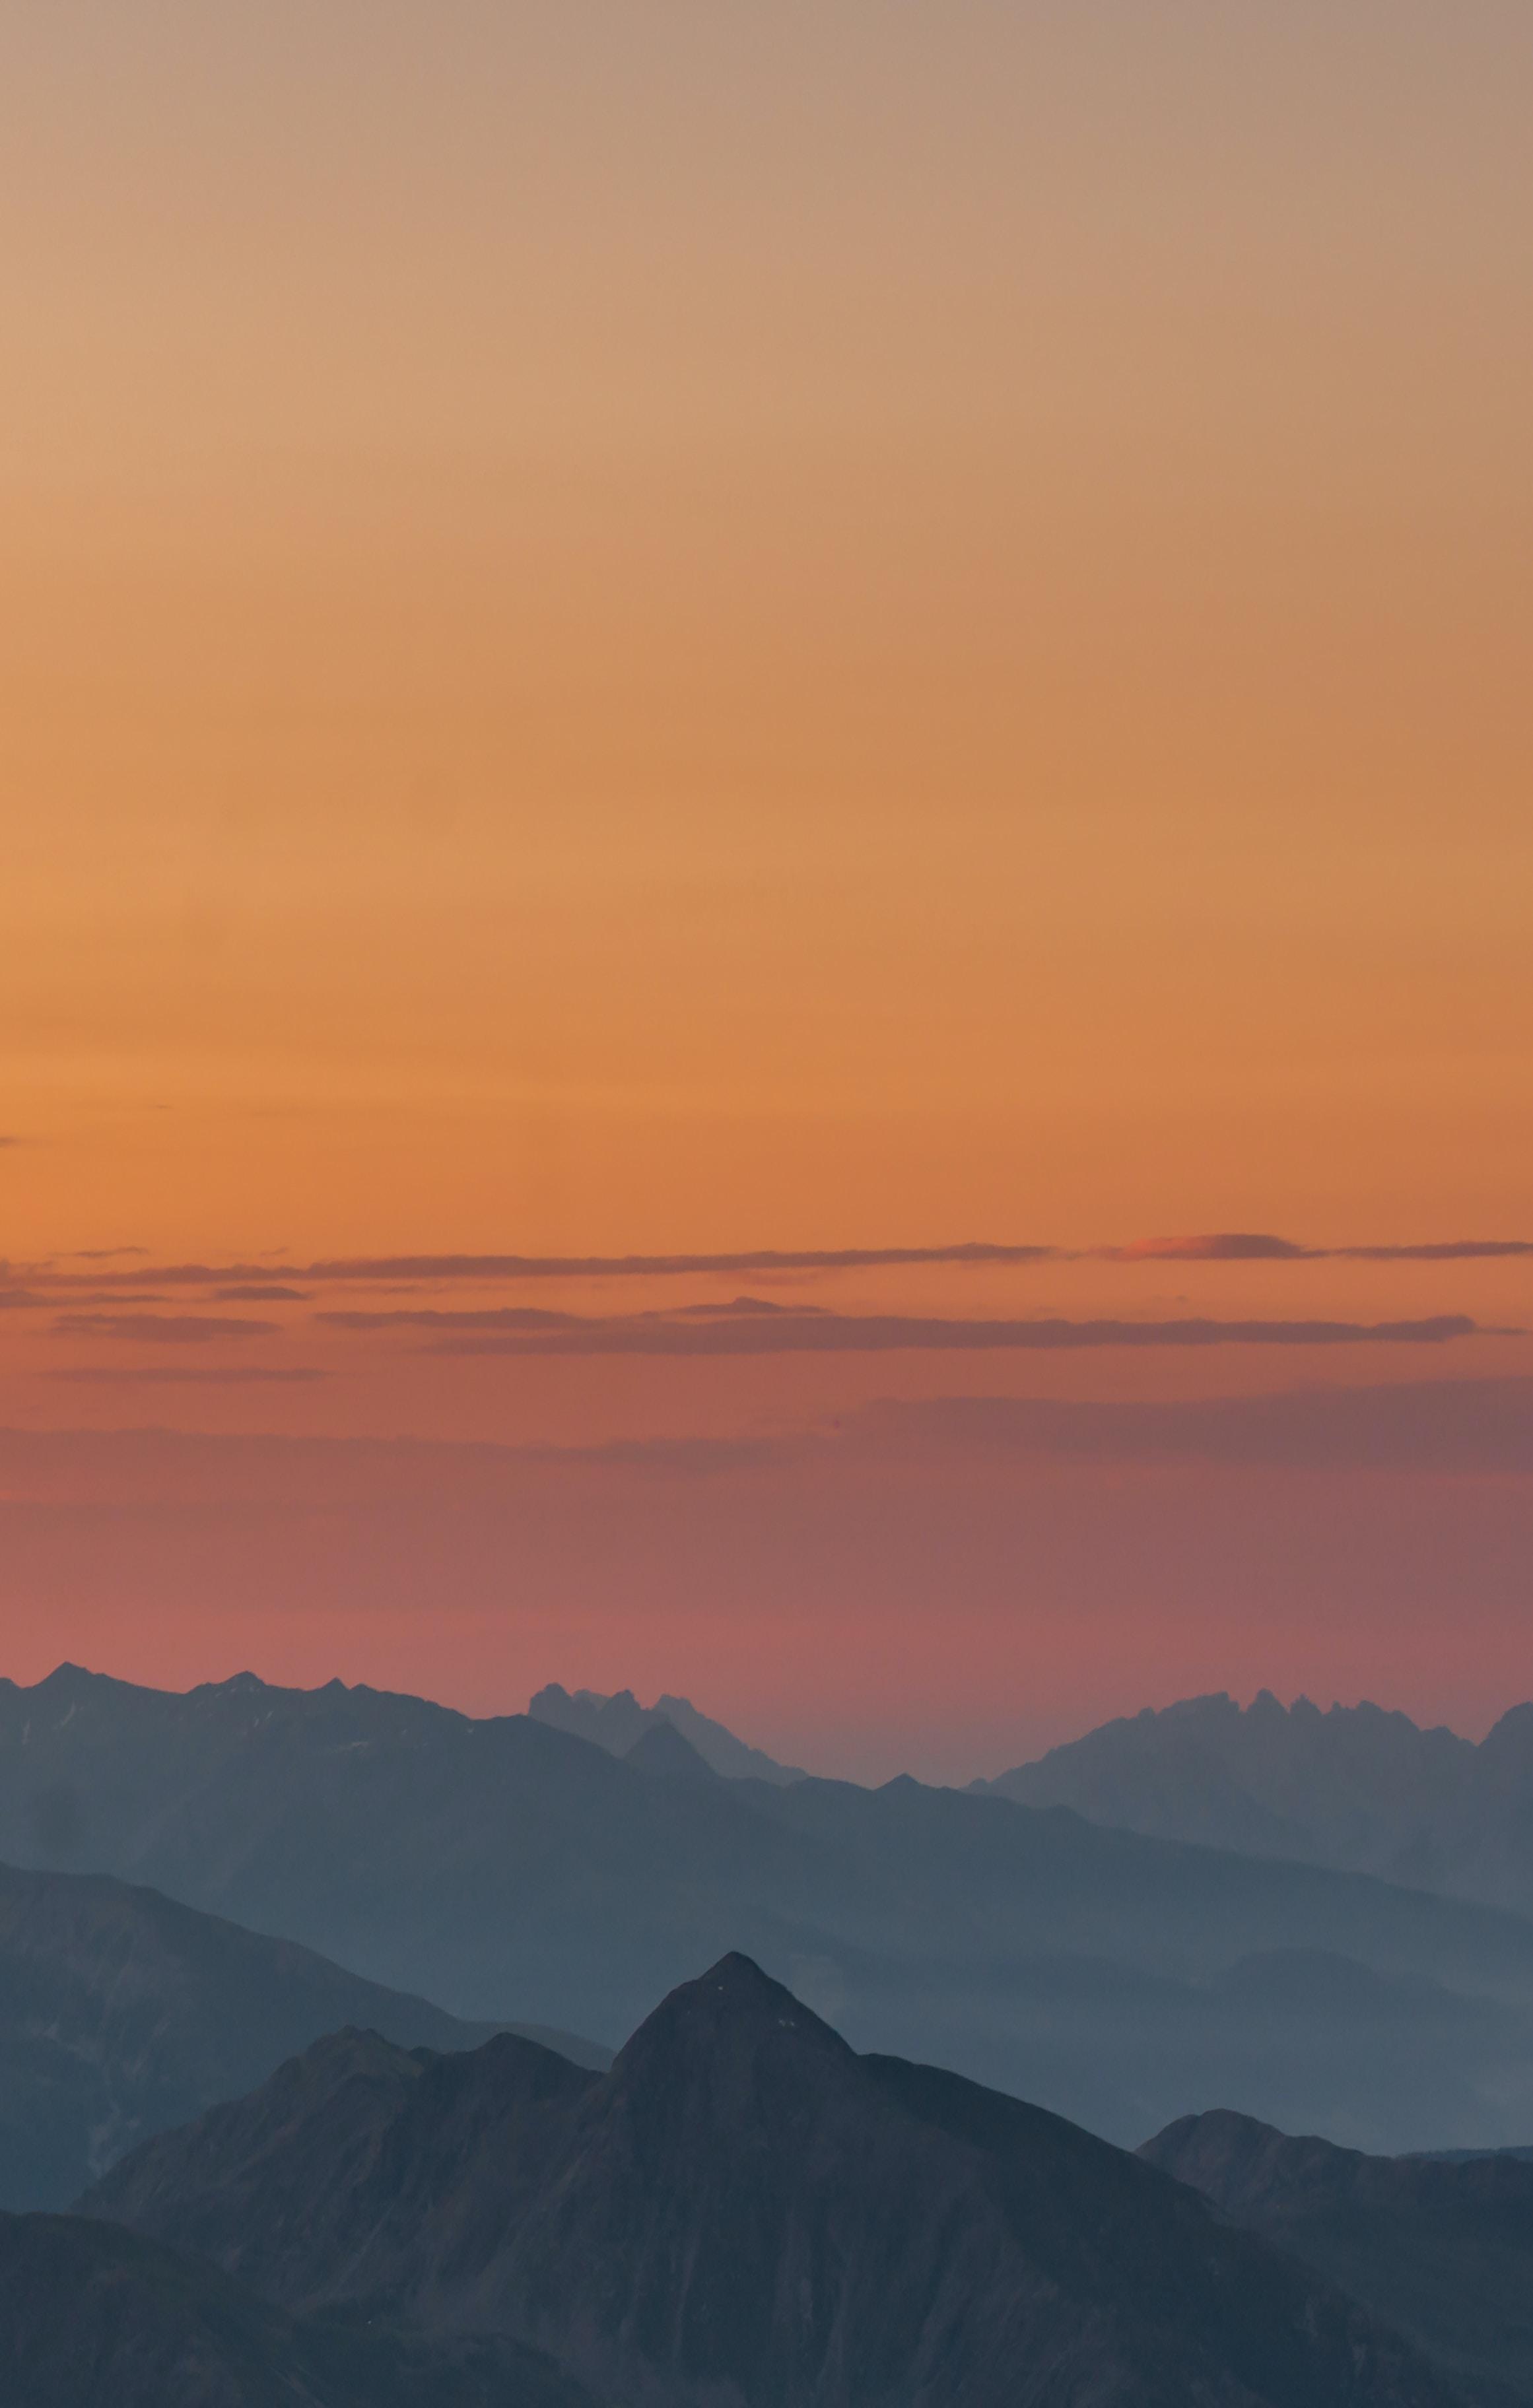 bird's eye photography of mountain